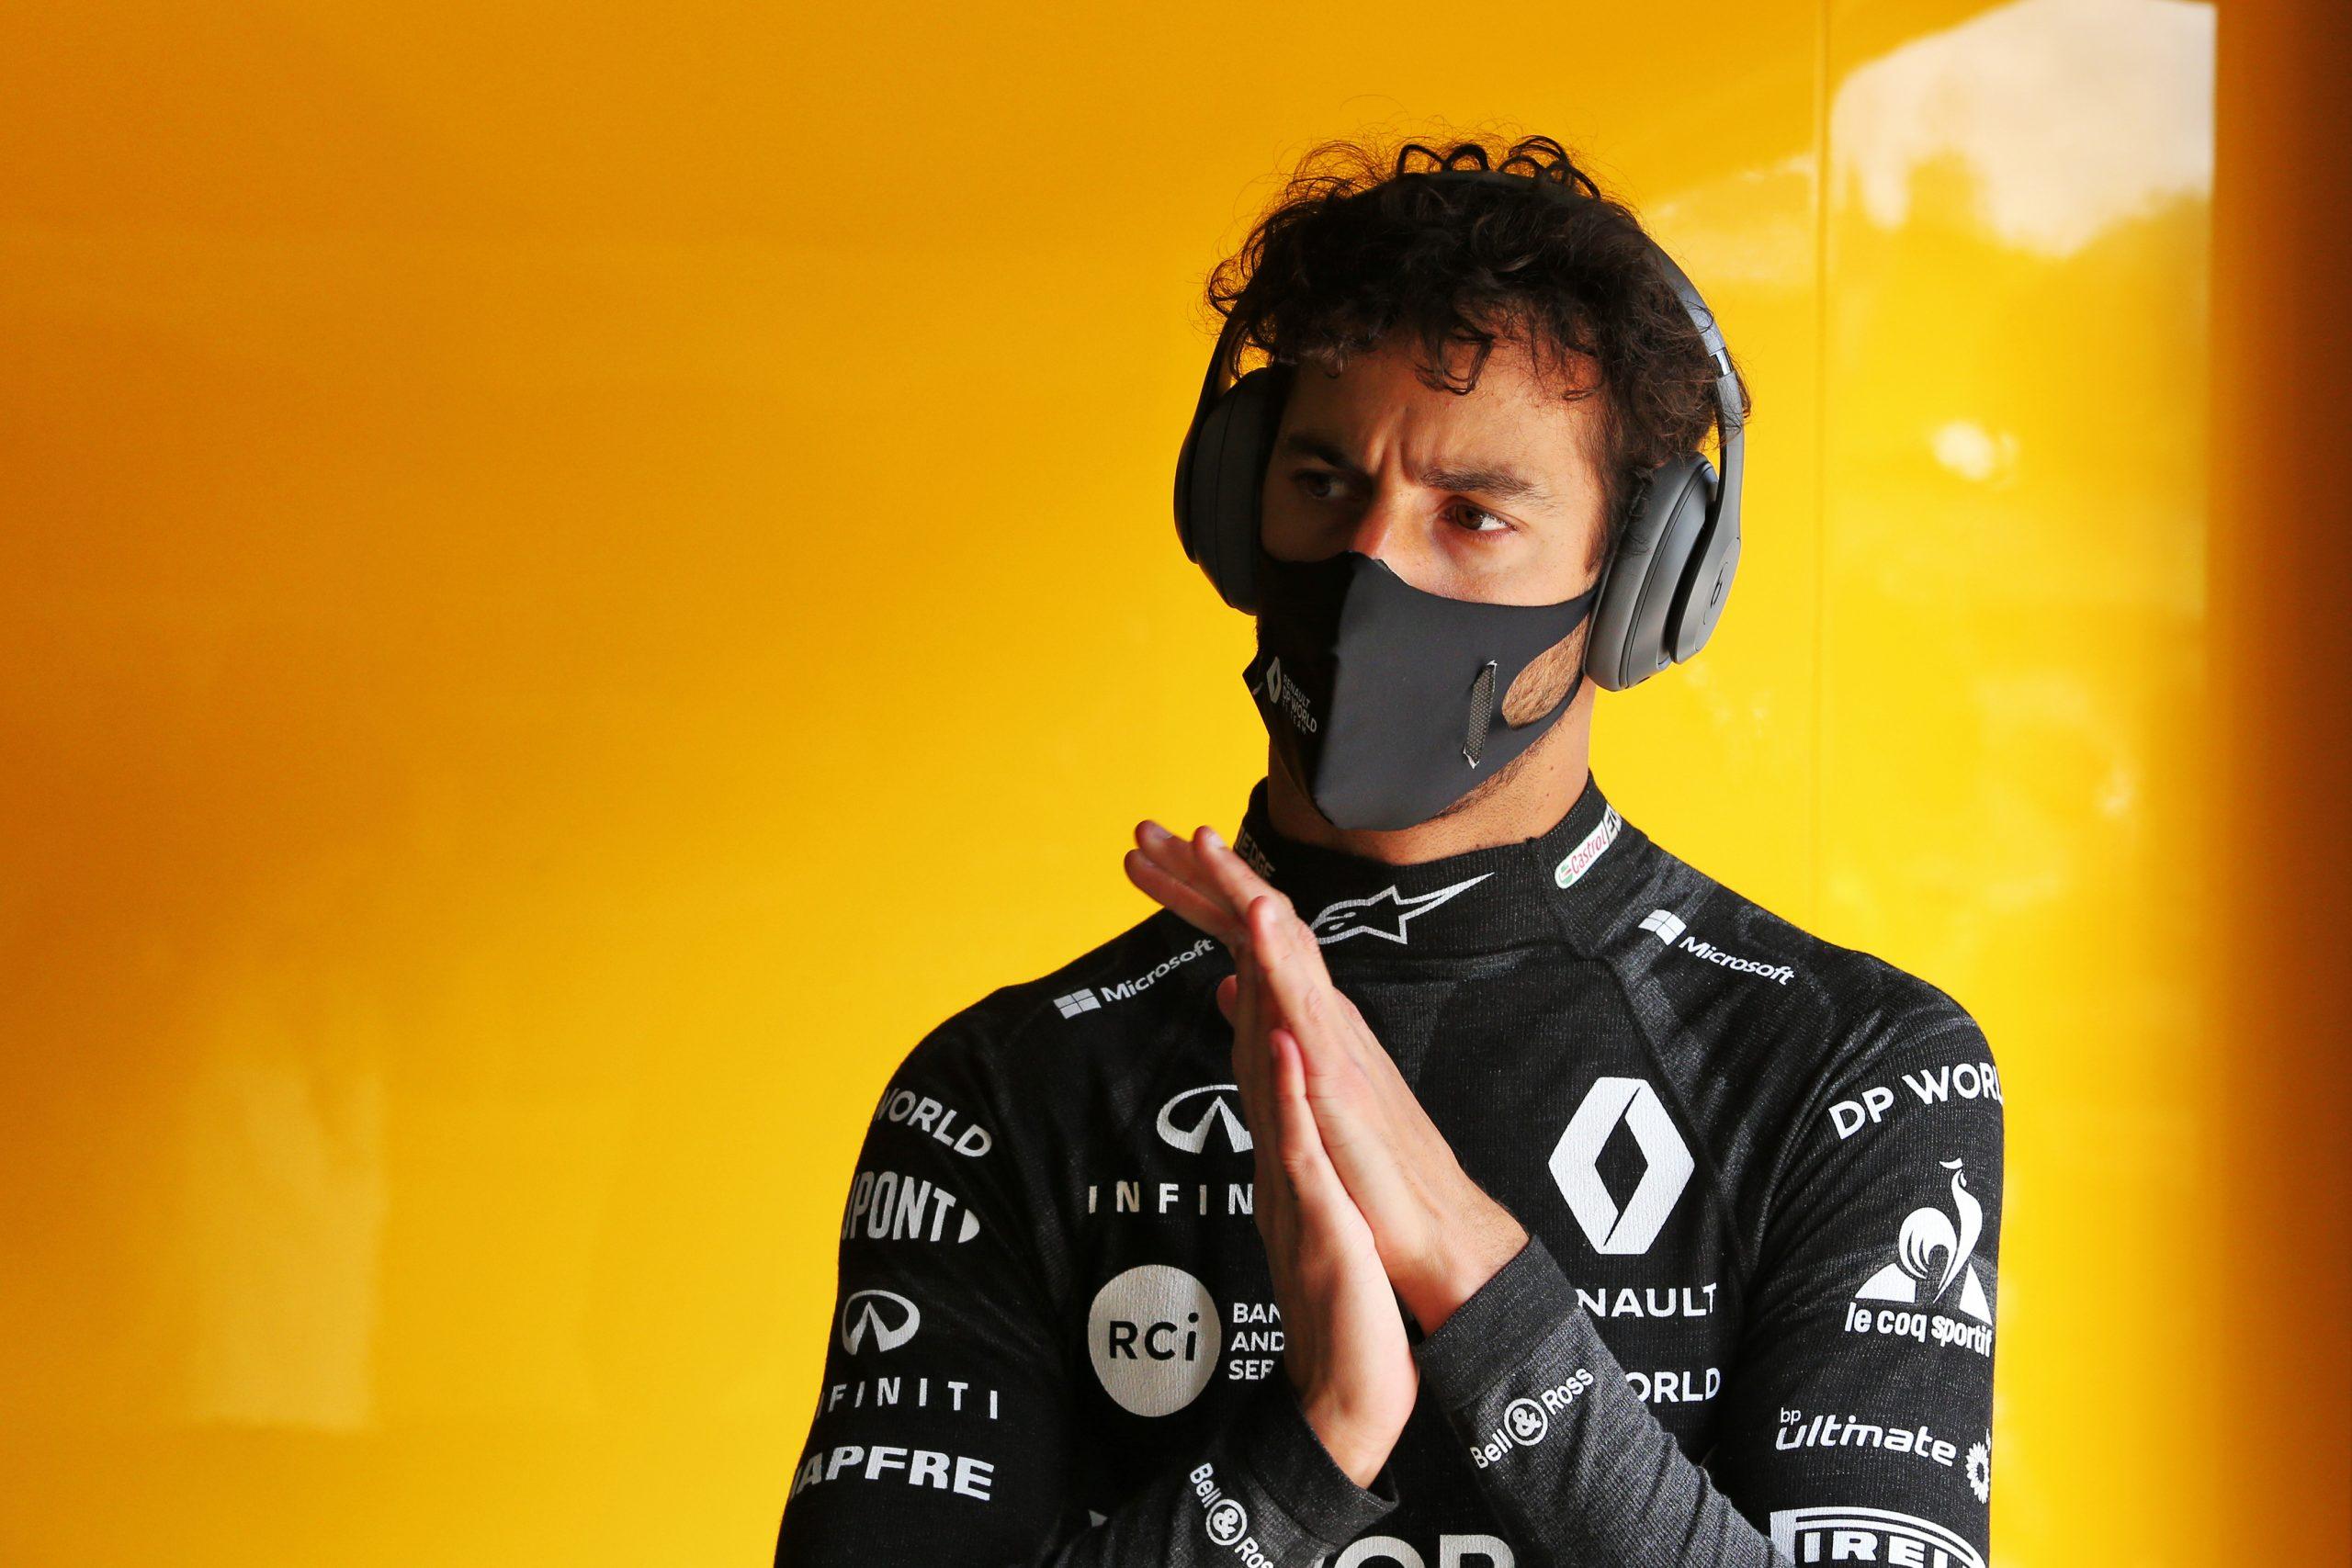 Ricciardo pense qu'il aurait dû bloquer Lance Stroll en fin de course 1